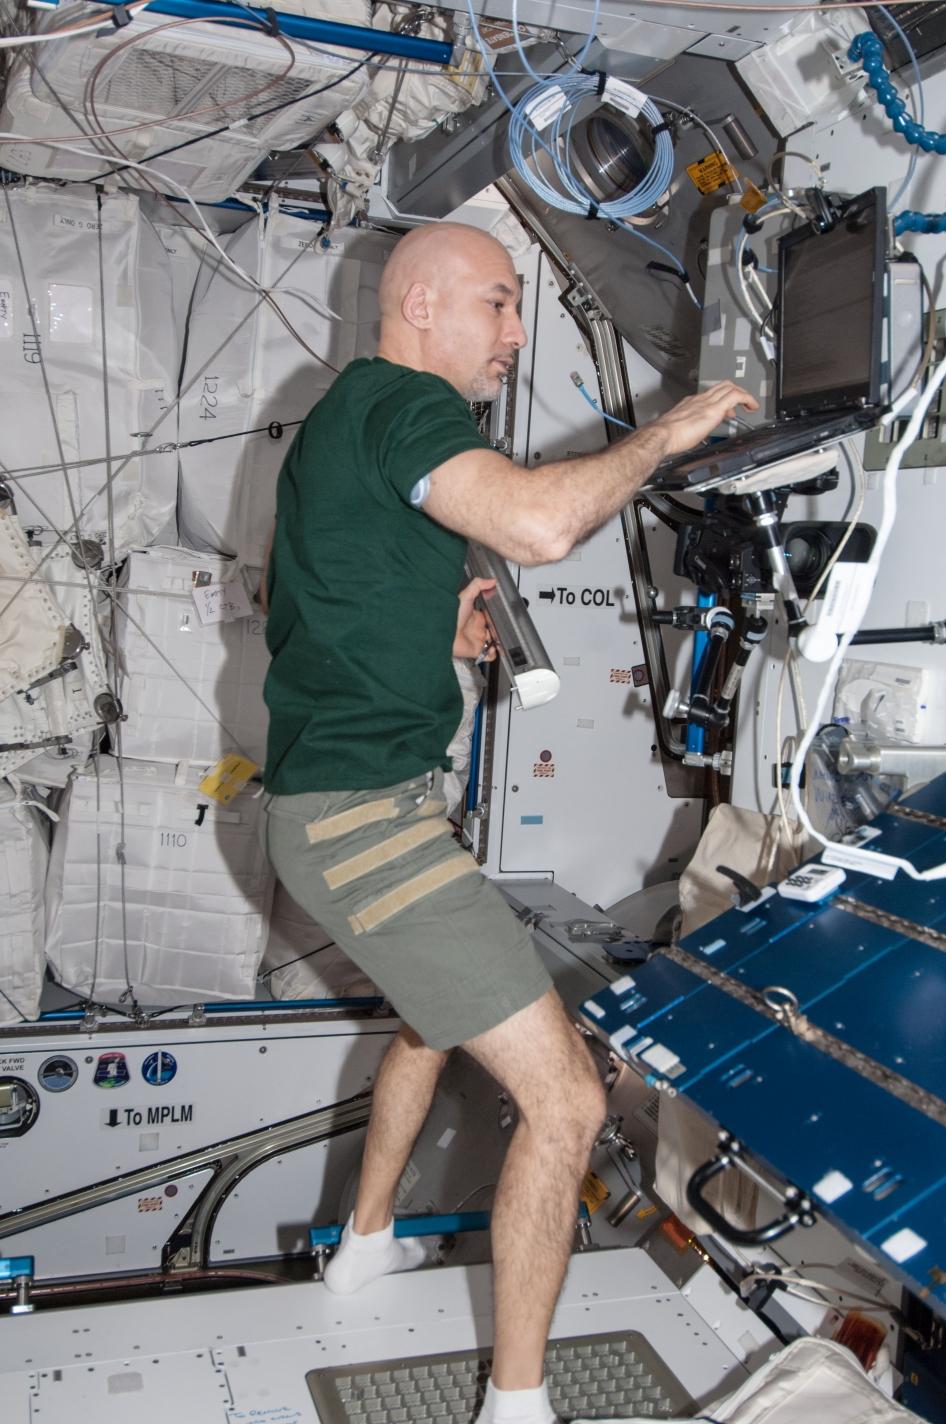 european space agency astronaut jobs - photo #15